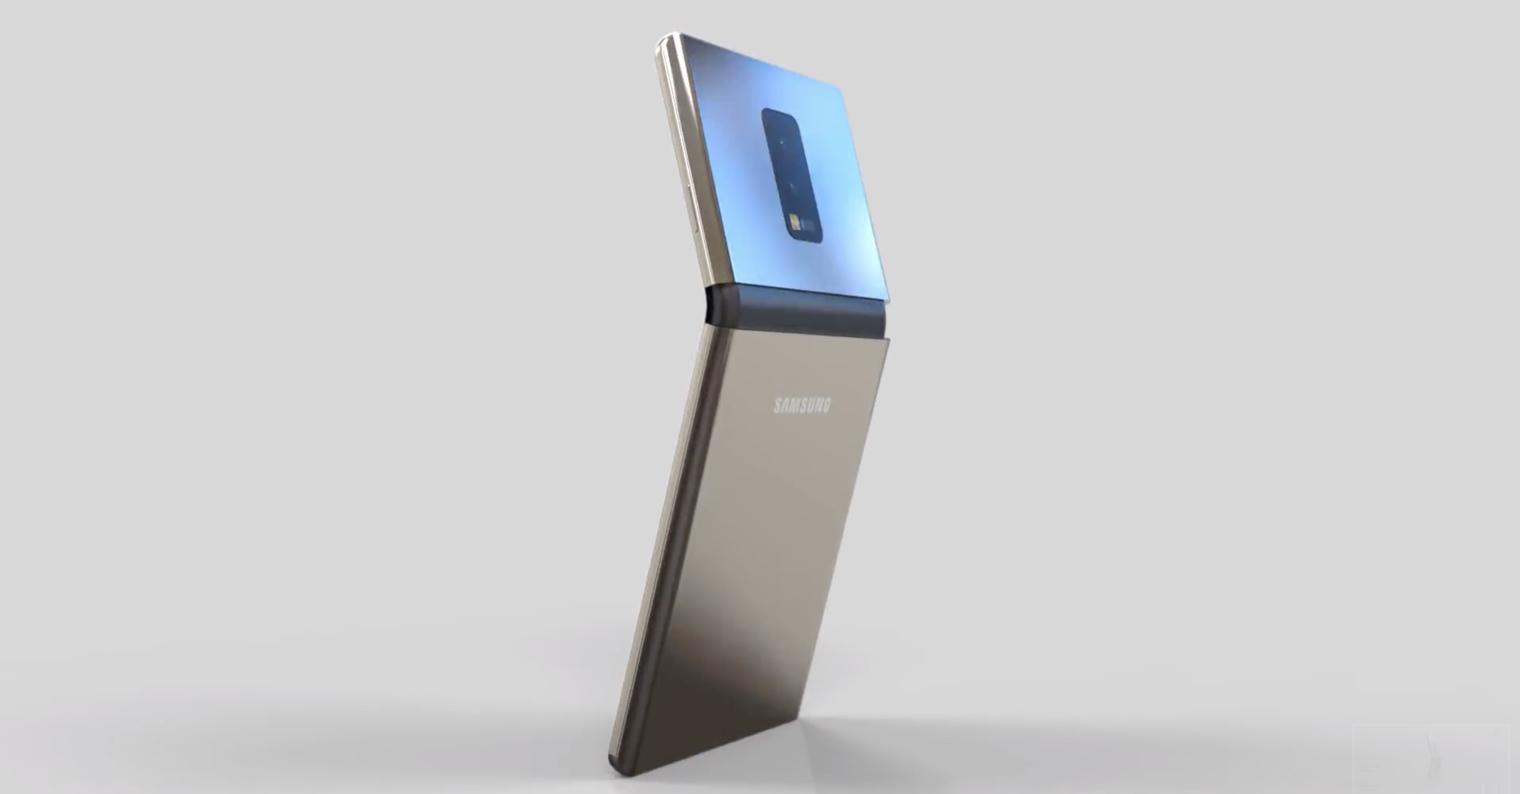 Samasung foldable smartphone FB